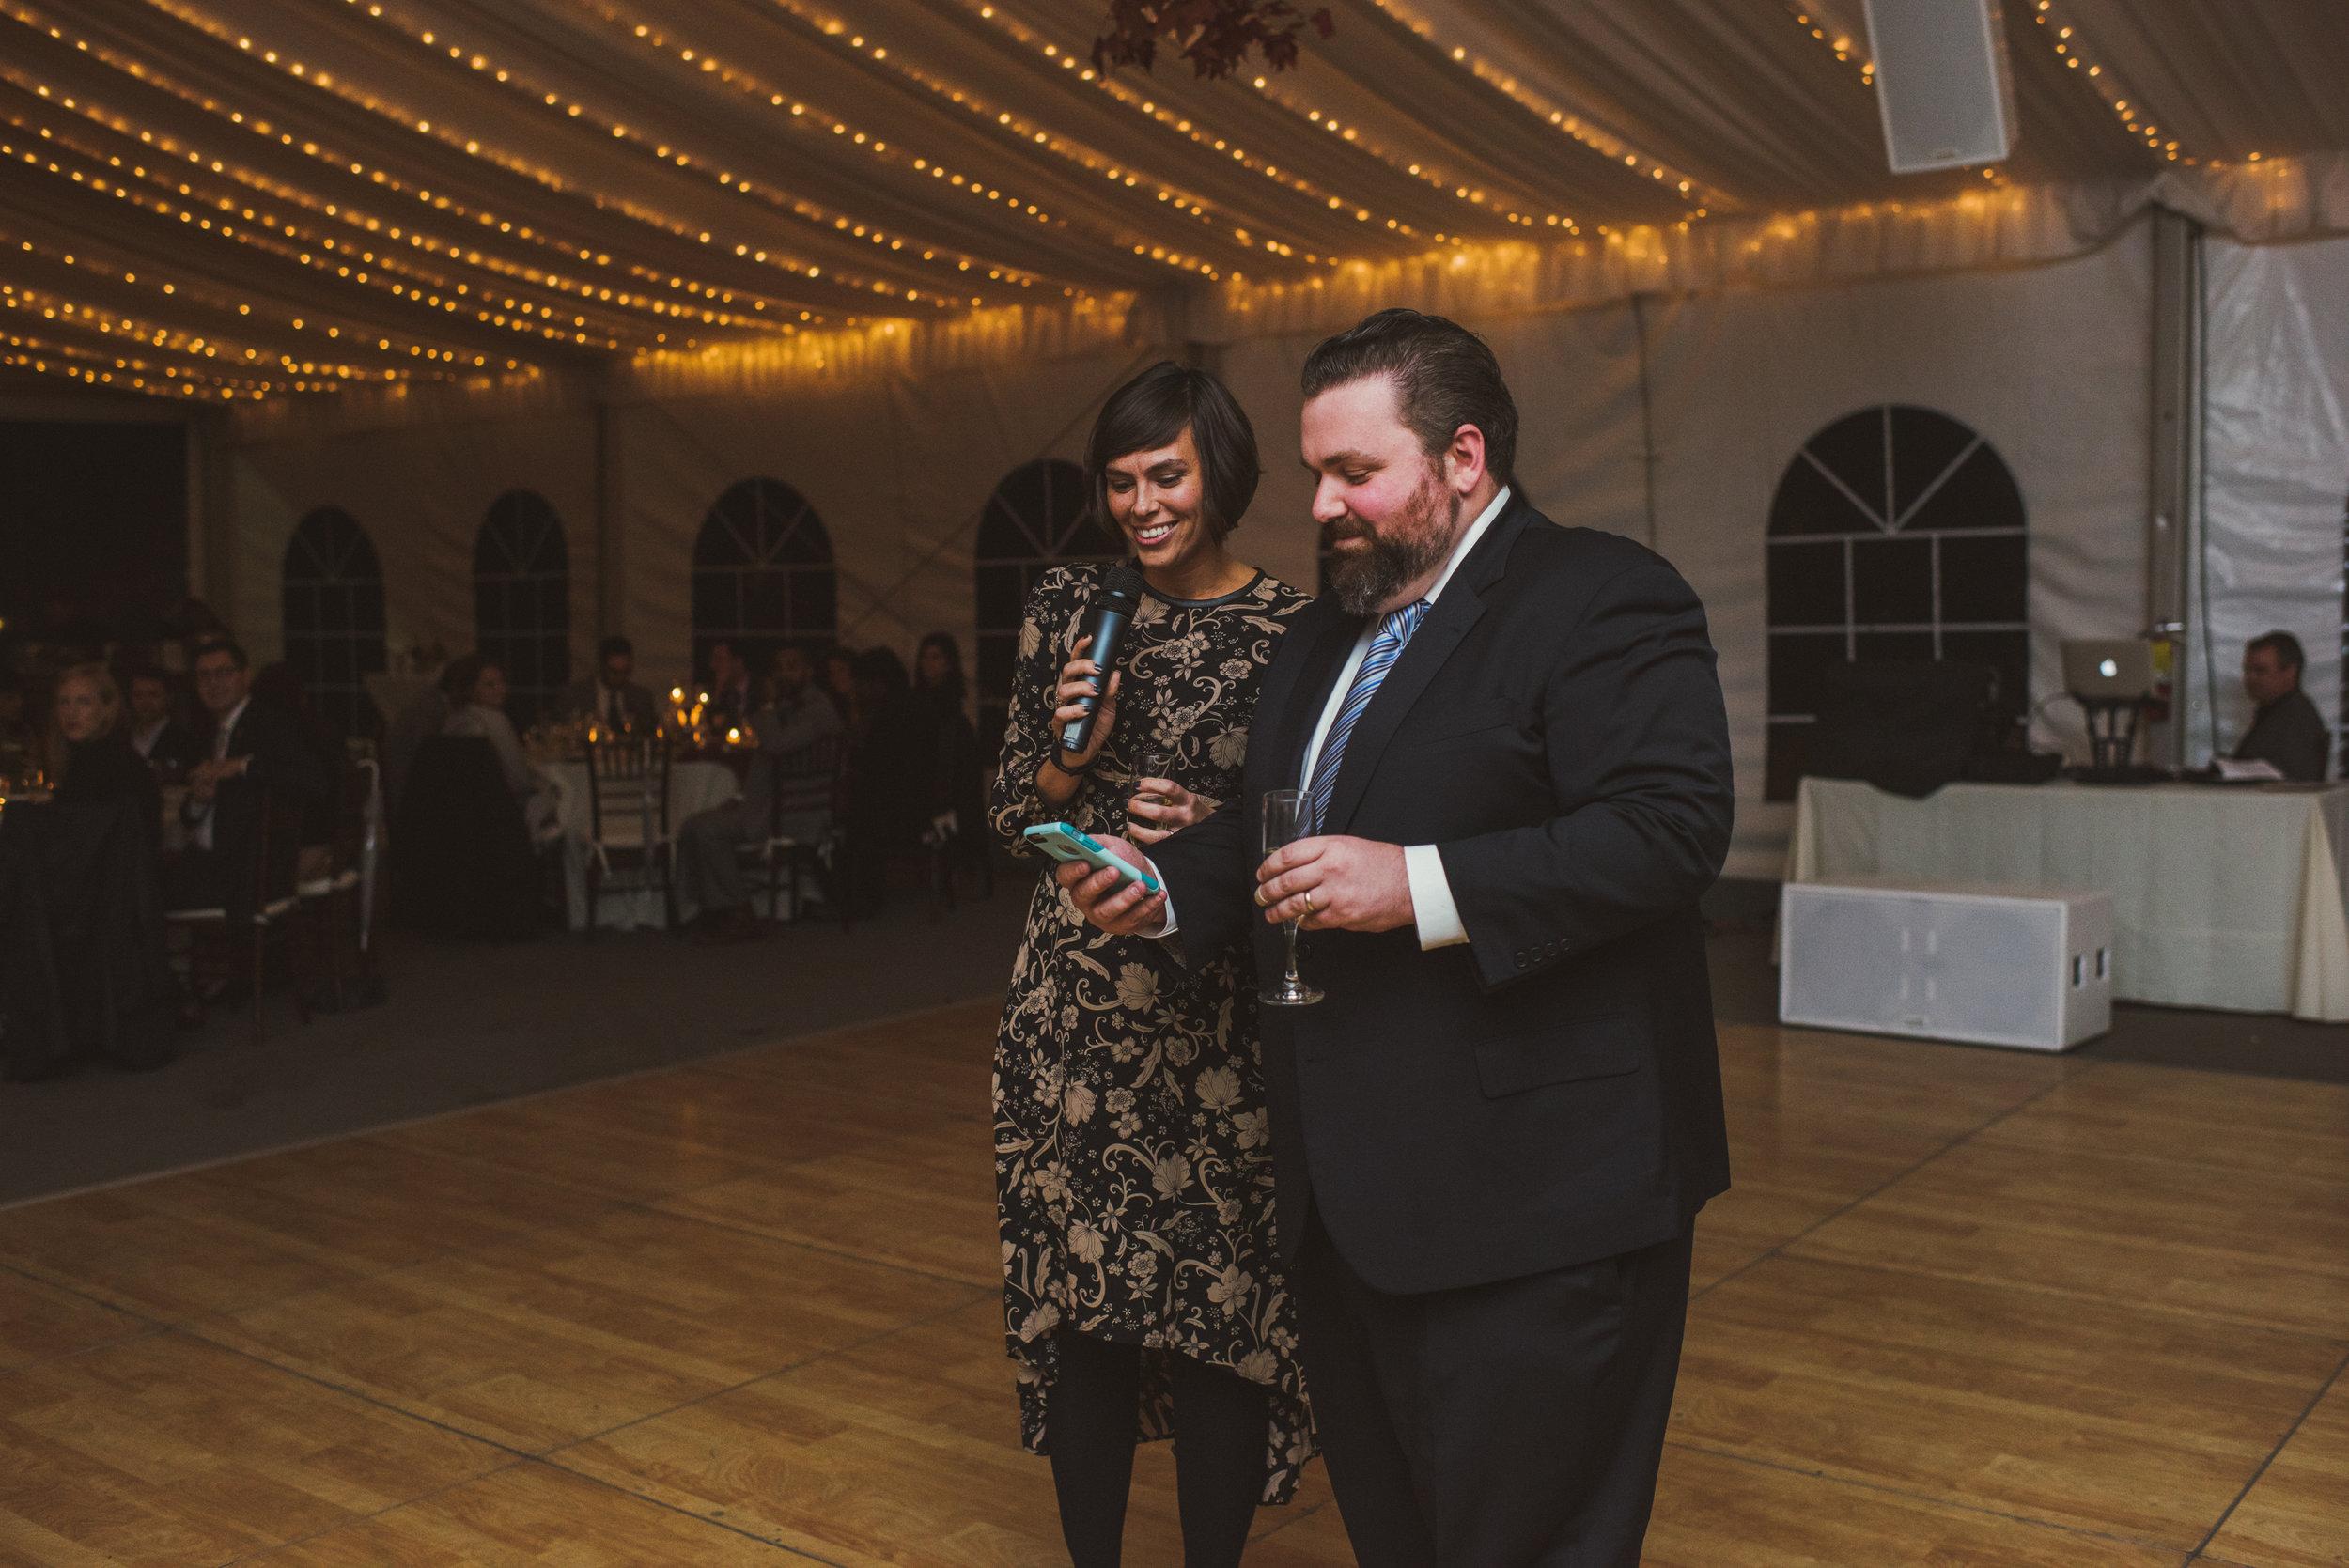 JACQUELINE & ANDREW WARSHAWER -BROOKMILL FARM FALL WEDDING - INTIMATE WEDDING PHOTOGRAPHER - TWOTWENTY by CHI-CHI AGBIM-605.jpg